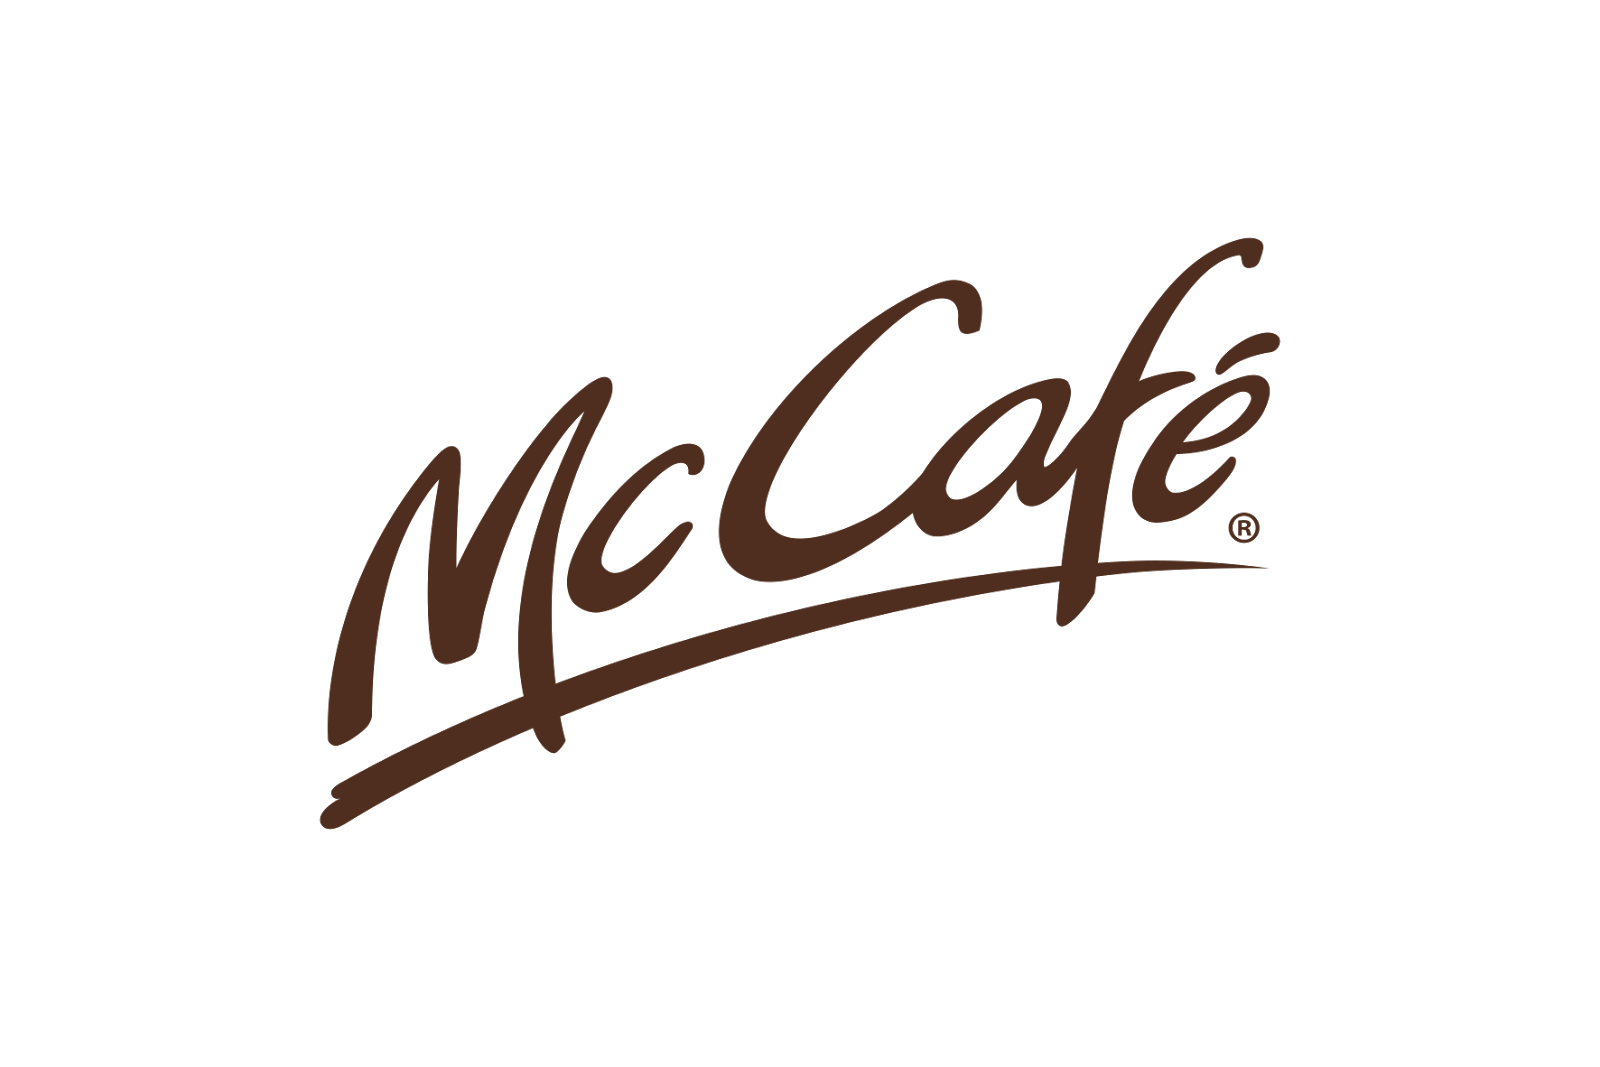 mc cafe logo